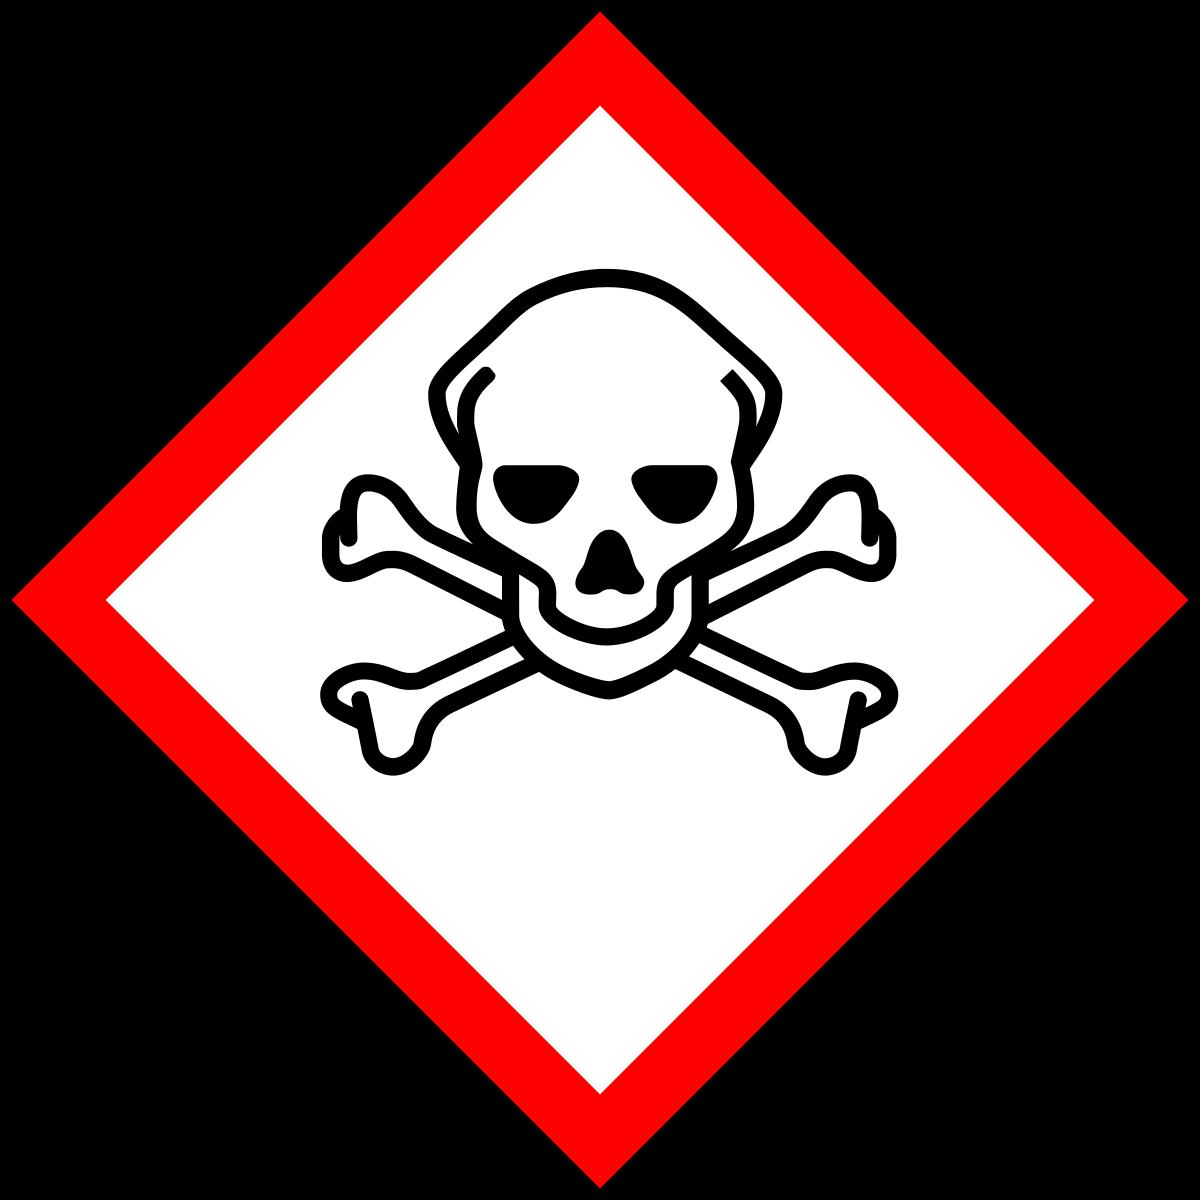 Emergency clipart danger symbol. Hazard wikipedia